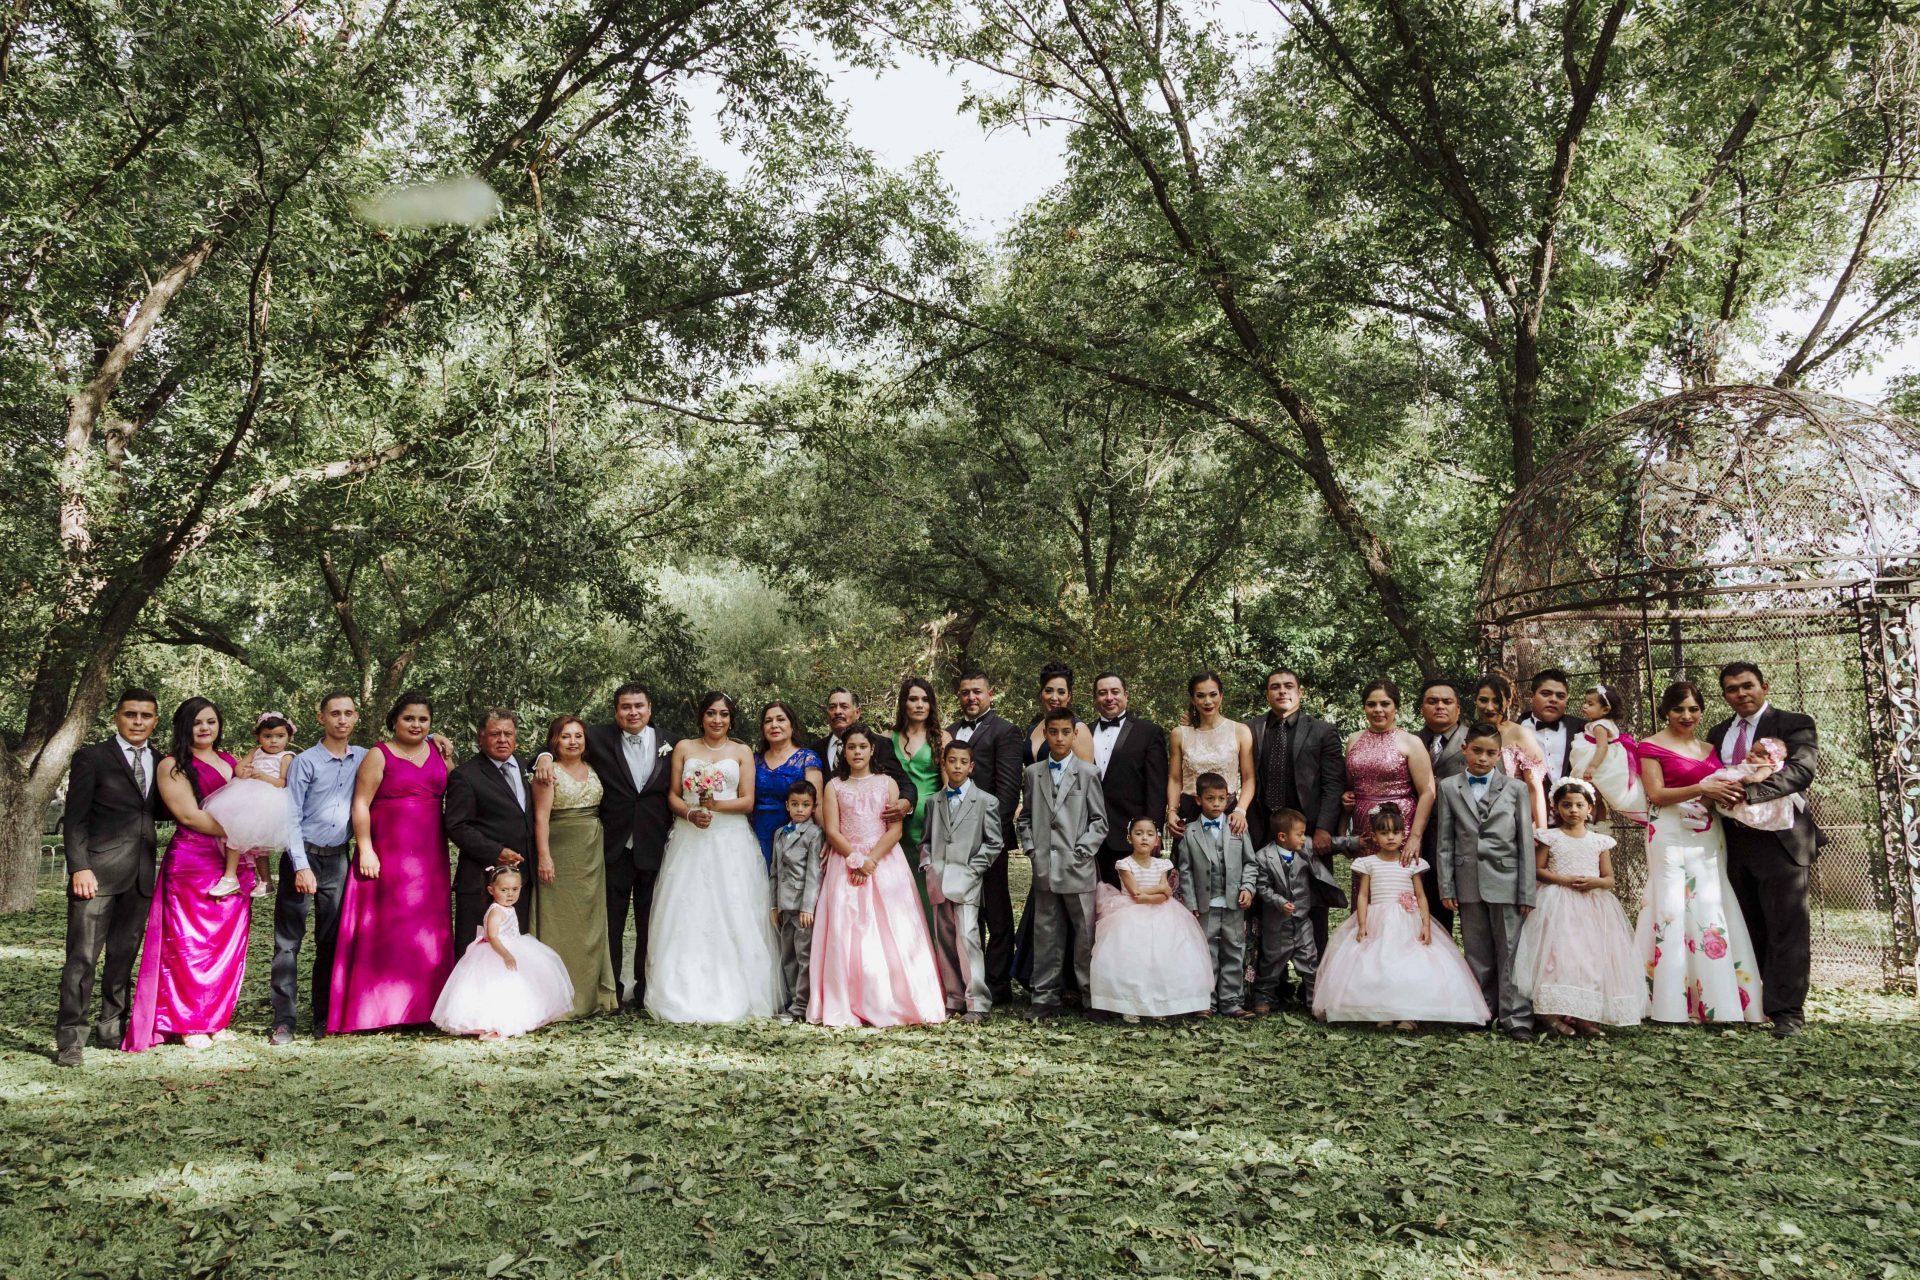 fotografo_profesional_zacatecas_chihuahua_bodas_xv_mexico-34